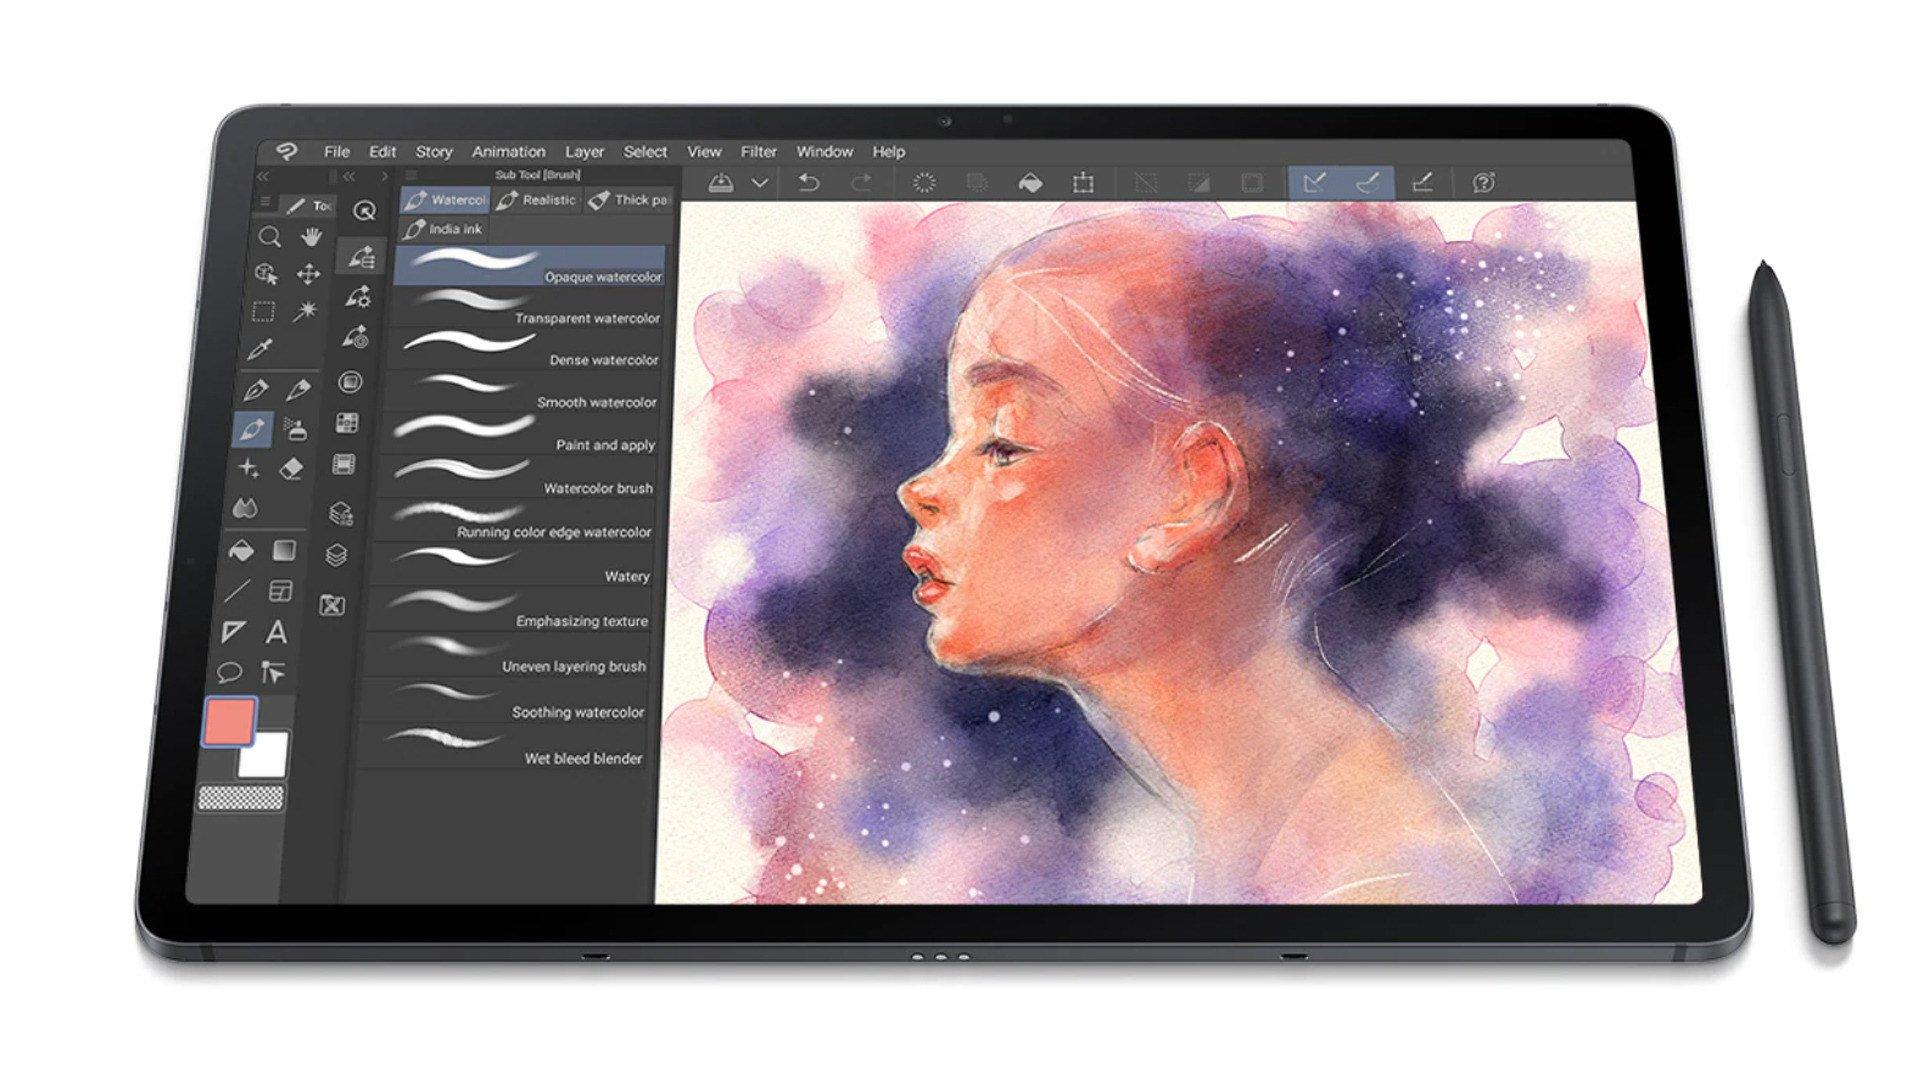 Samsung Galaxy Tab S7 FE: упрощённая версия Galaxy Tab S7+ с экраном на 12.4″, чипом Snapdragon 750G и стилусом S Pen за 649 евро